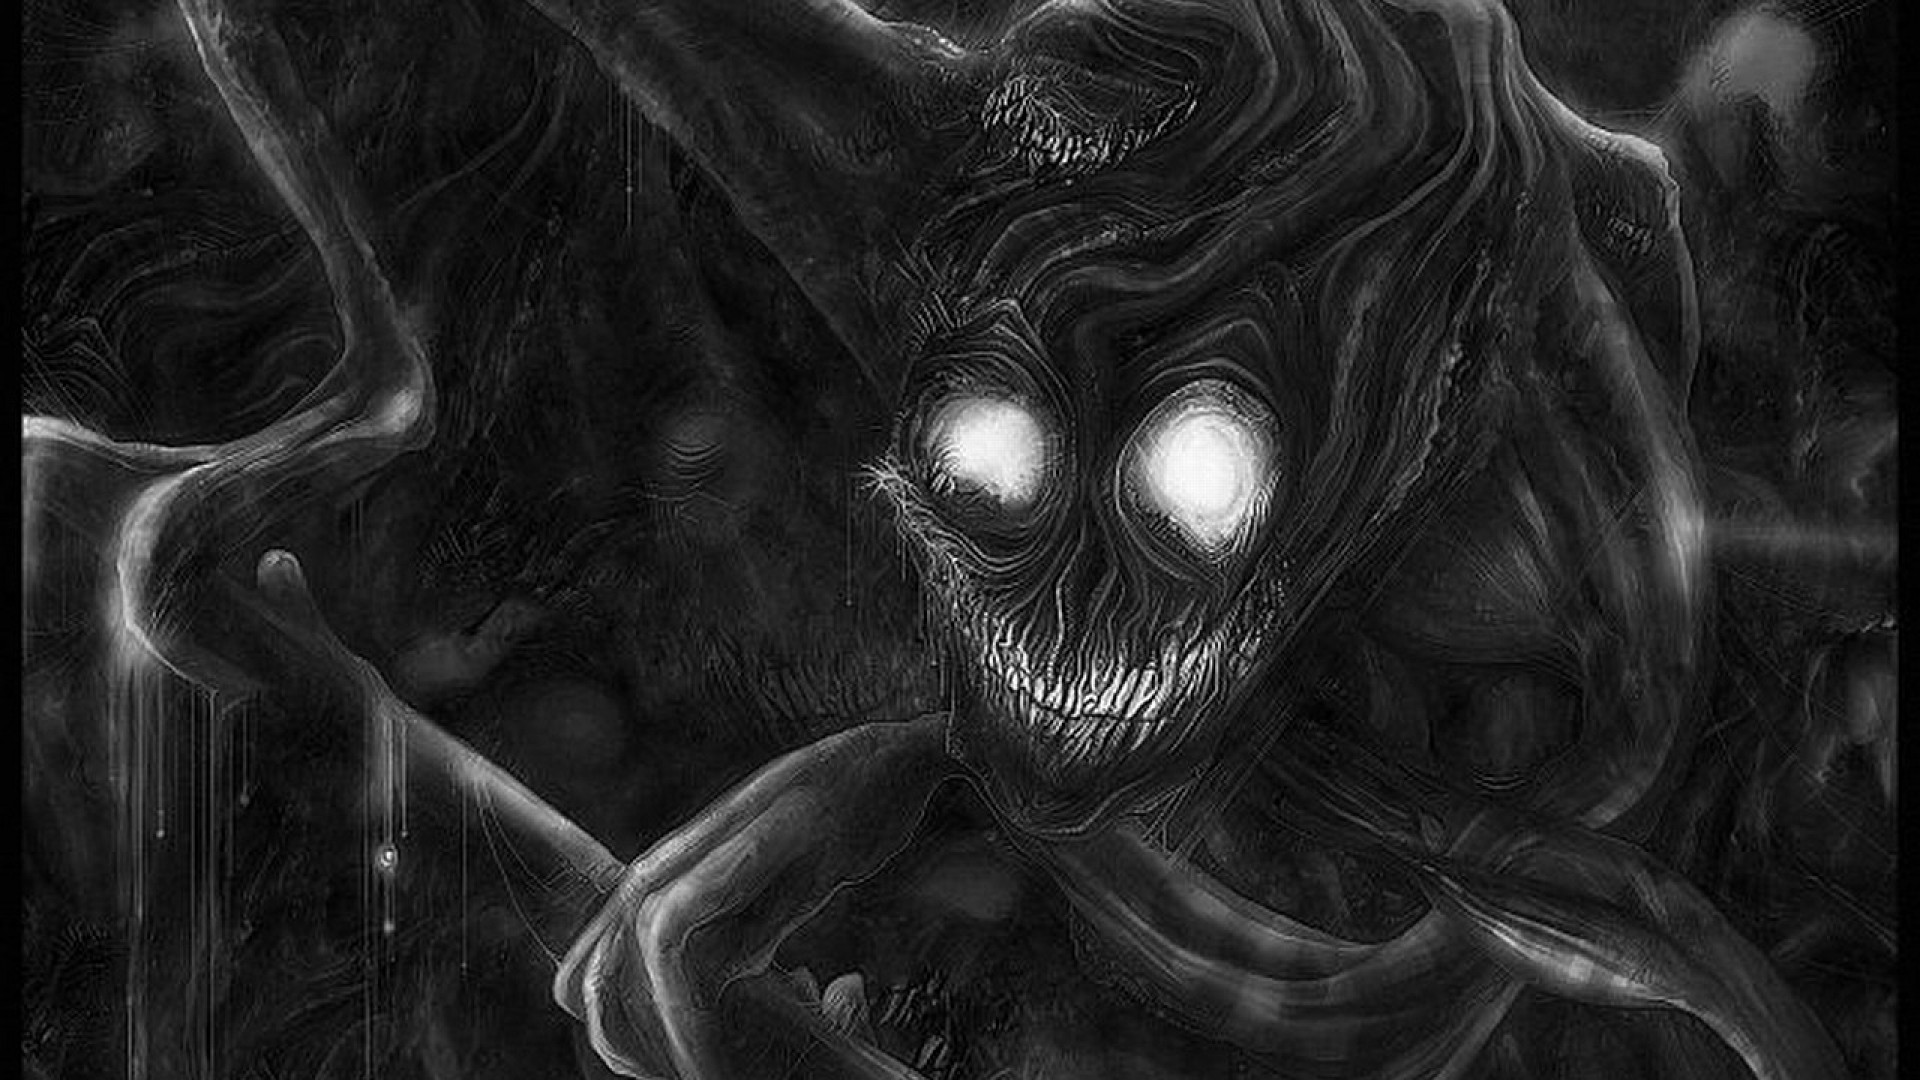 Top Wallpaper Halloween Supernatural - Spooky-Pictures-Wallpapers-010  Picture_16182.jpg